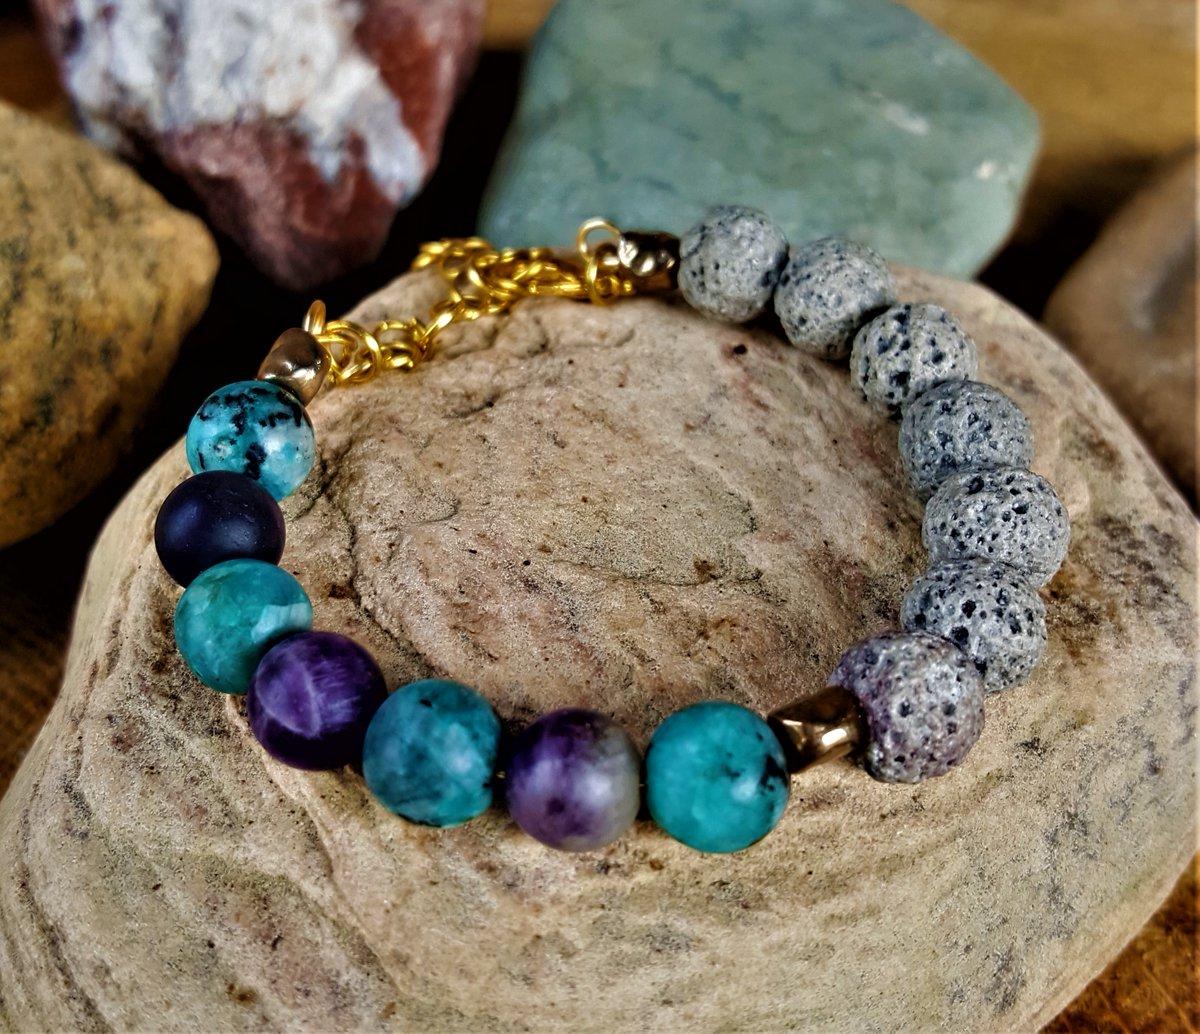 NATURAL AQUA BLUE JADE / AMETHYST/ LAVA ROCK GEMSTONE BEADED BRACELET https://t.co/SUdi473Ycr #jewelryforsale #Gemstone  #Healing #handmadegifts  #gemstonebracelets #Chakra #jewelryaddict #essentialoils  #fashion #giftsforher #giftshop https://t.co/N2AgmnknNs